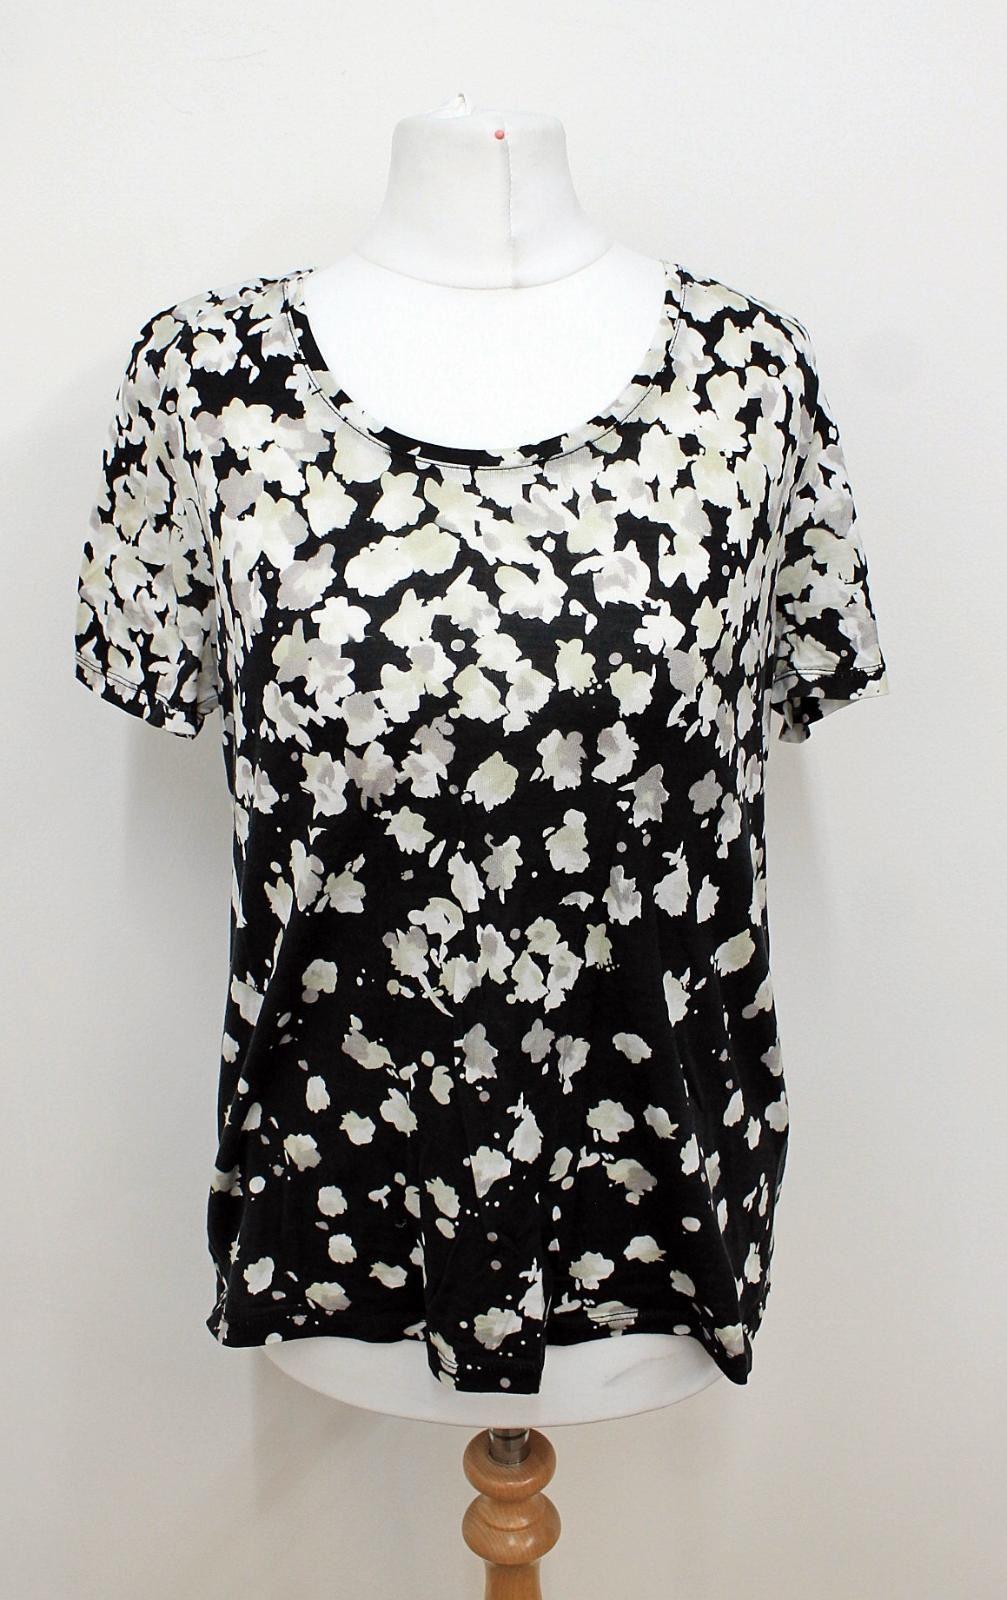 GERARD-DAREL-Ladies-Black-White-Floral-Print-Short-Sleeved-Top-Size-2-UK8